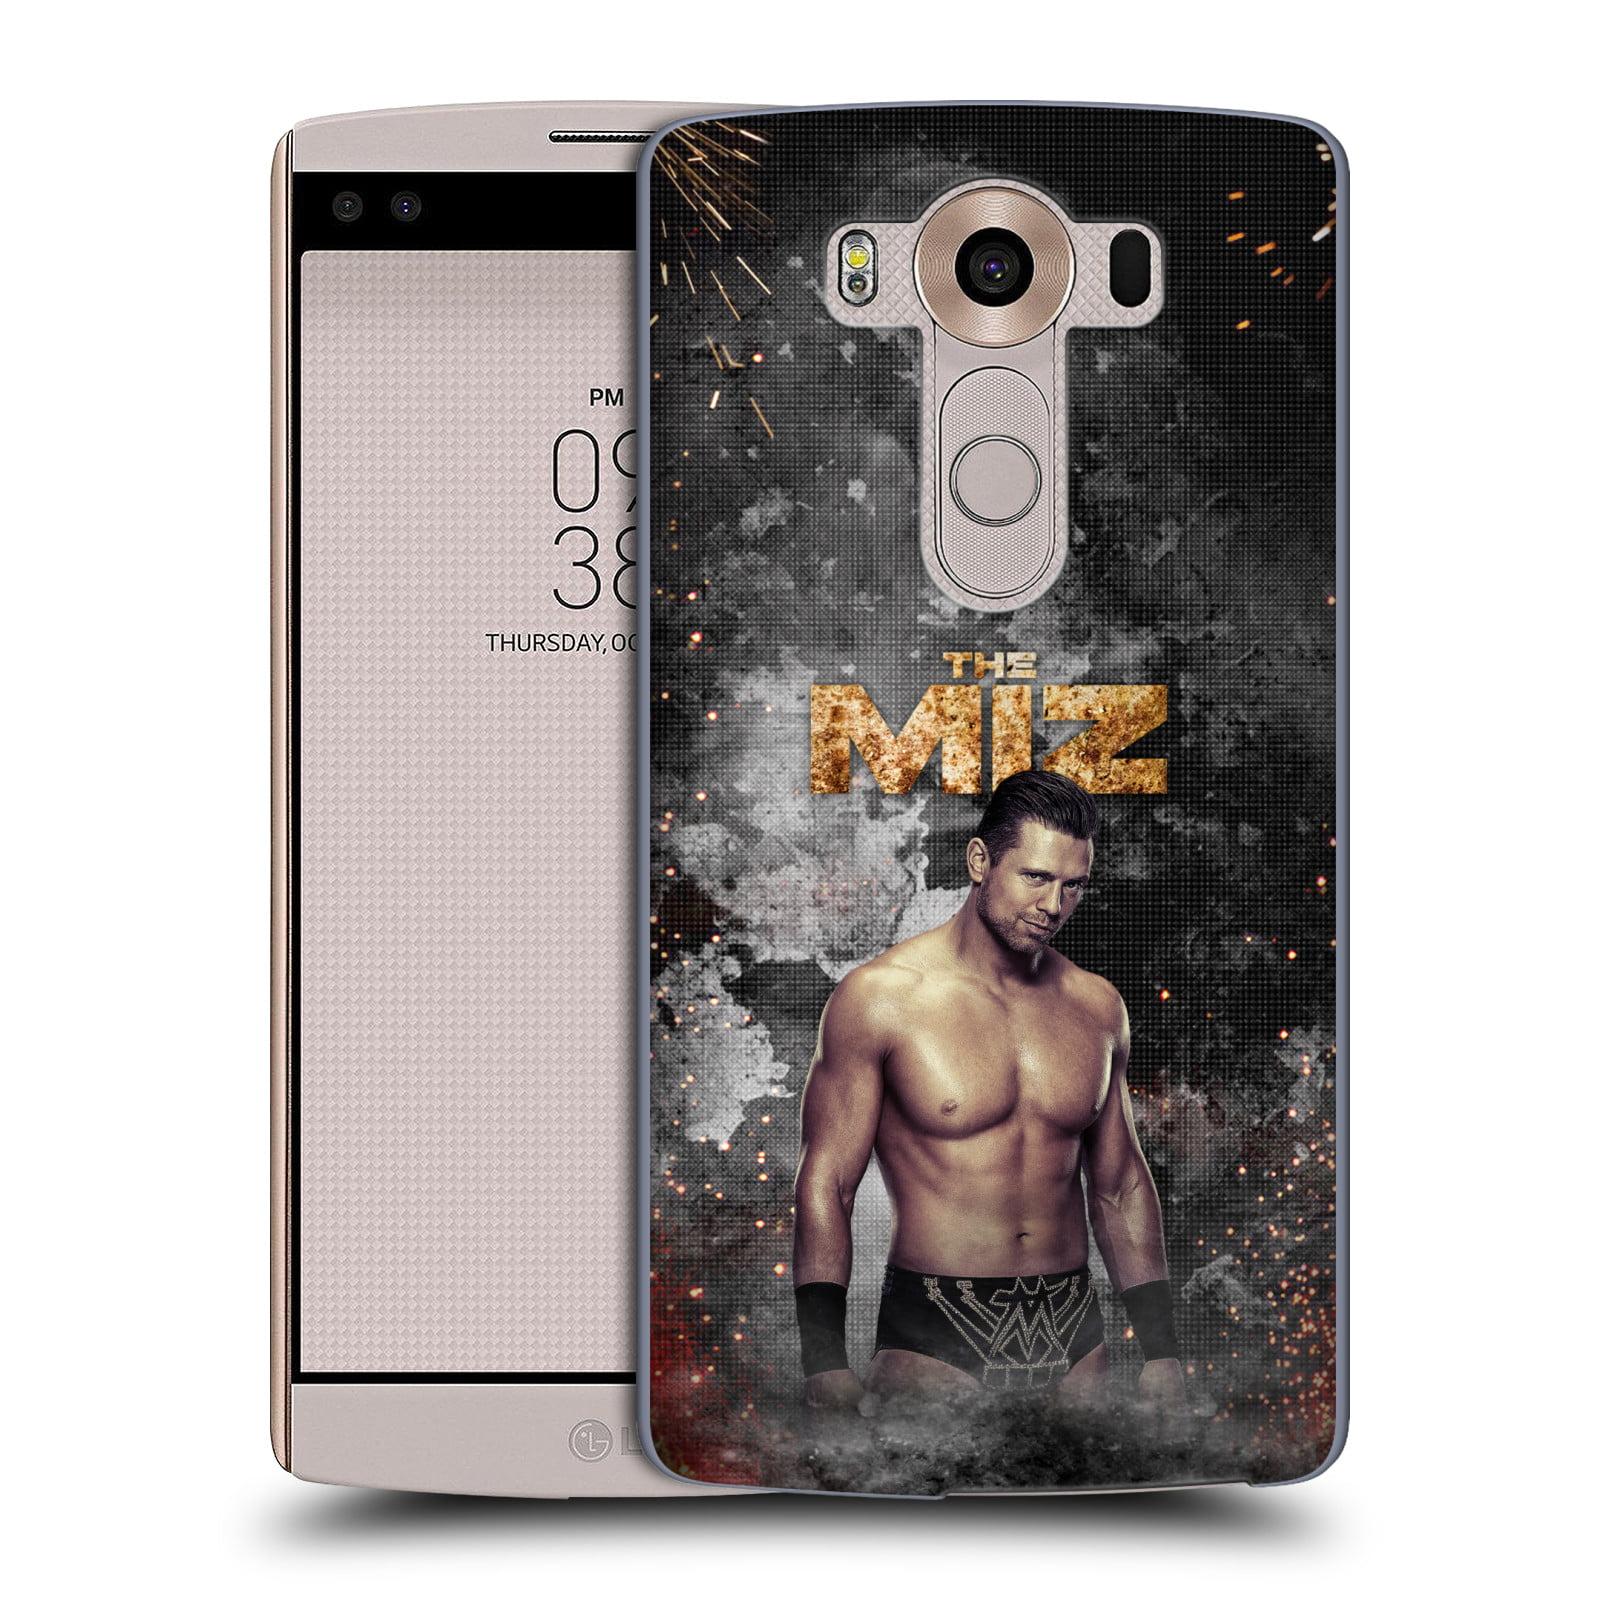 OFFICIAL WWE THE MIZ HARD BACK CASE FOR LG PHONES 1